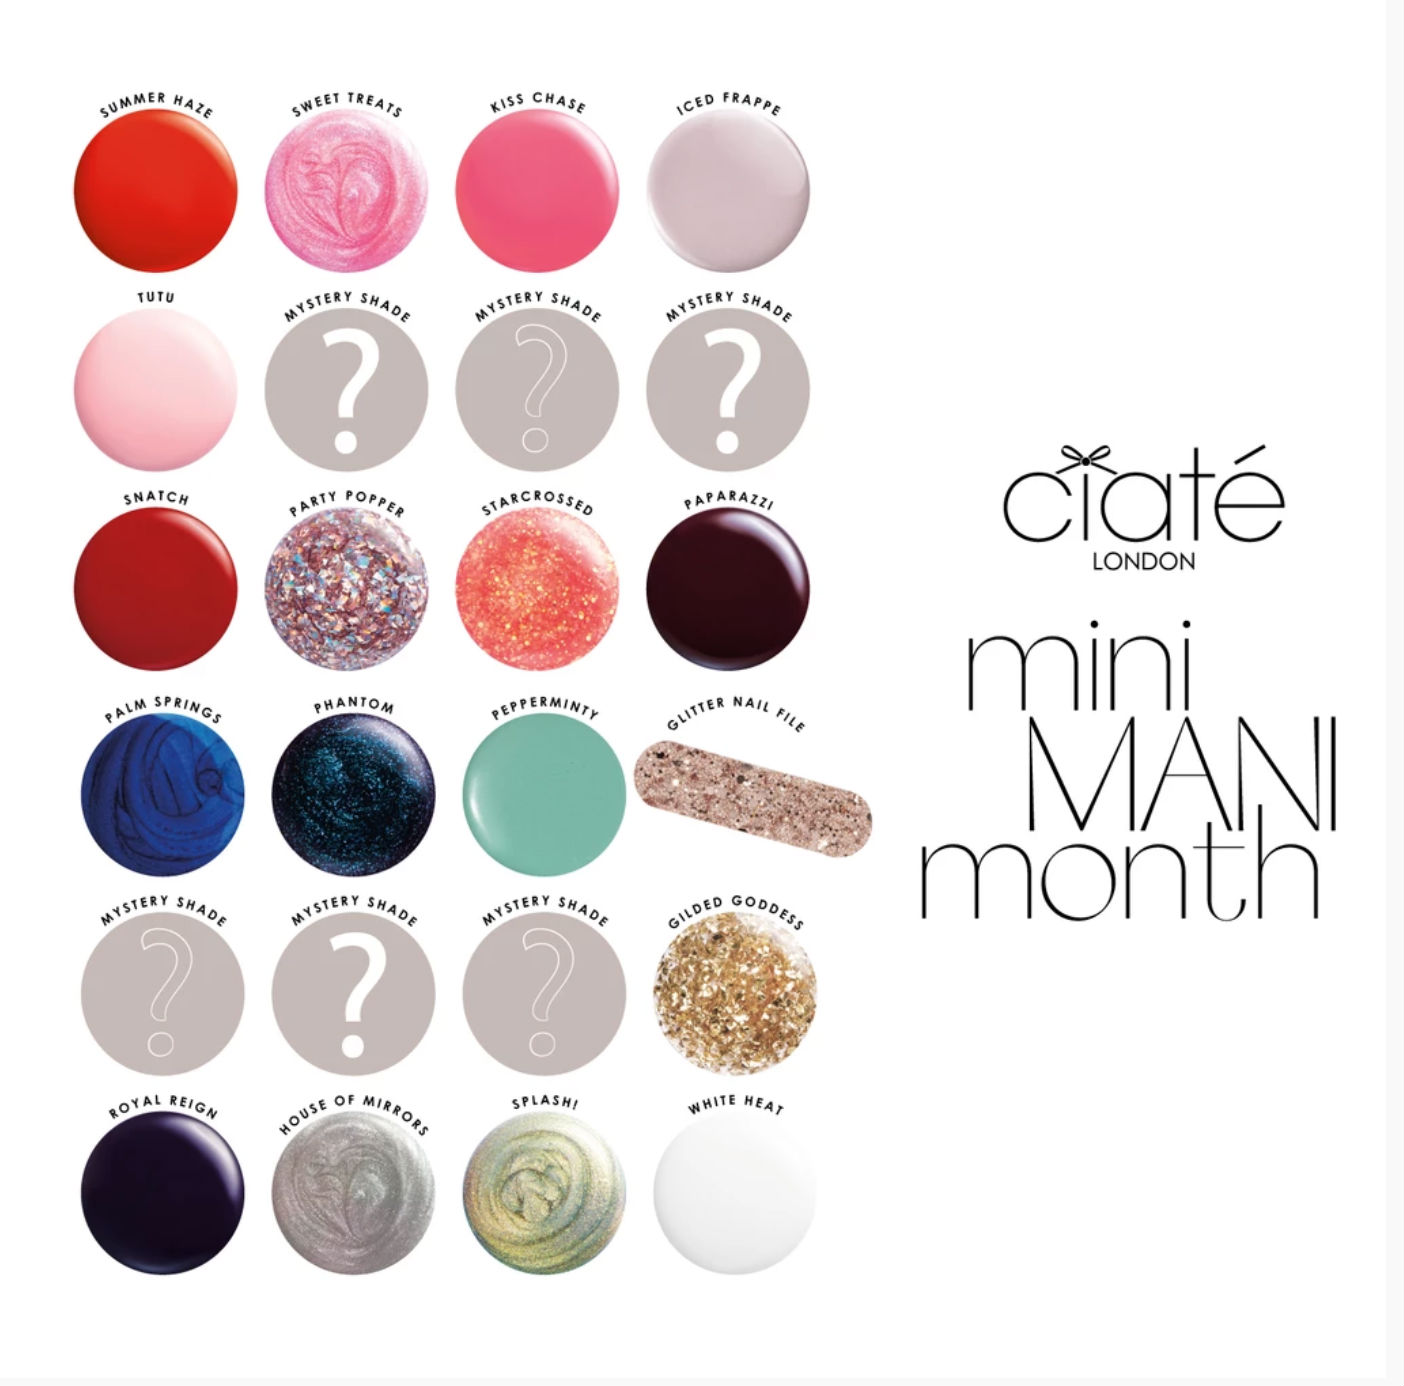 Ciaté London 2019 Mini Mani Month